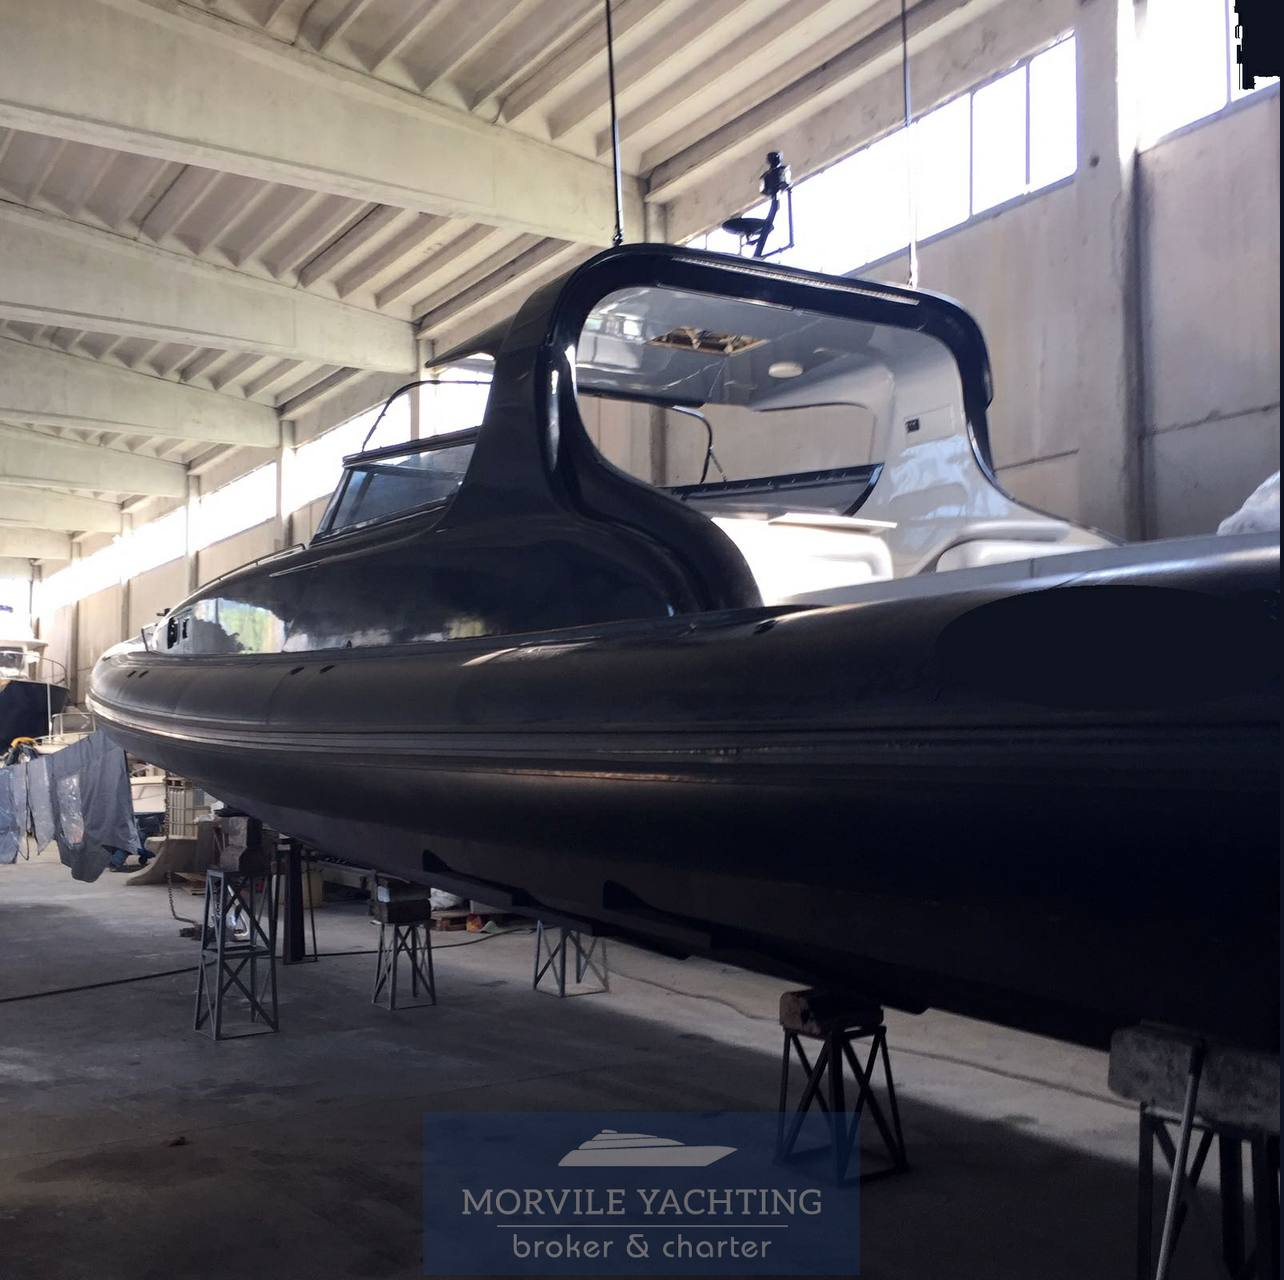 Novamarine Tecno 55 Gommone used boats for sale